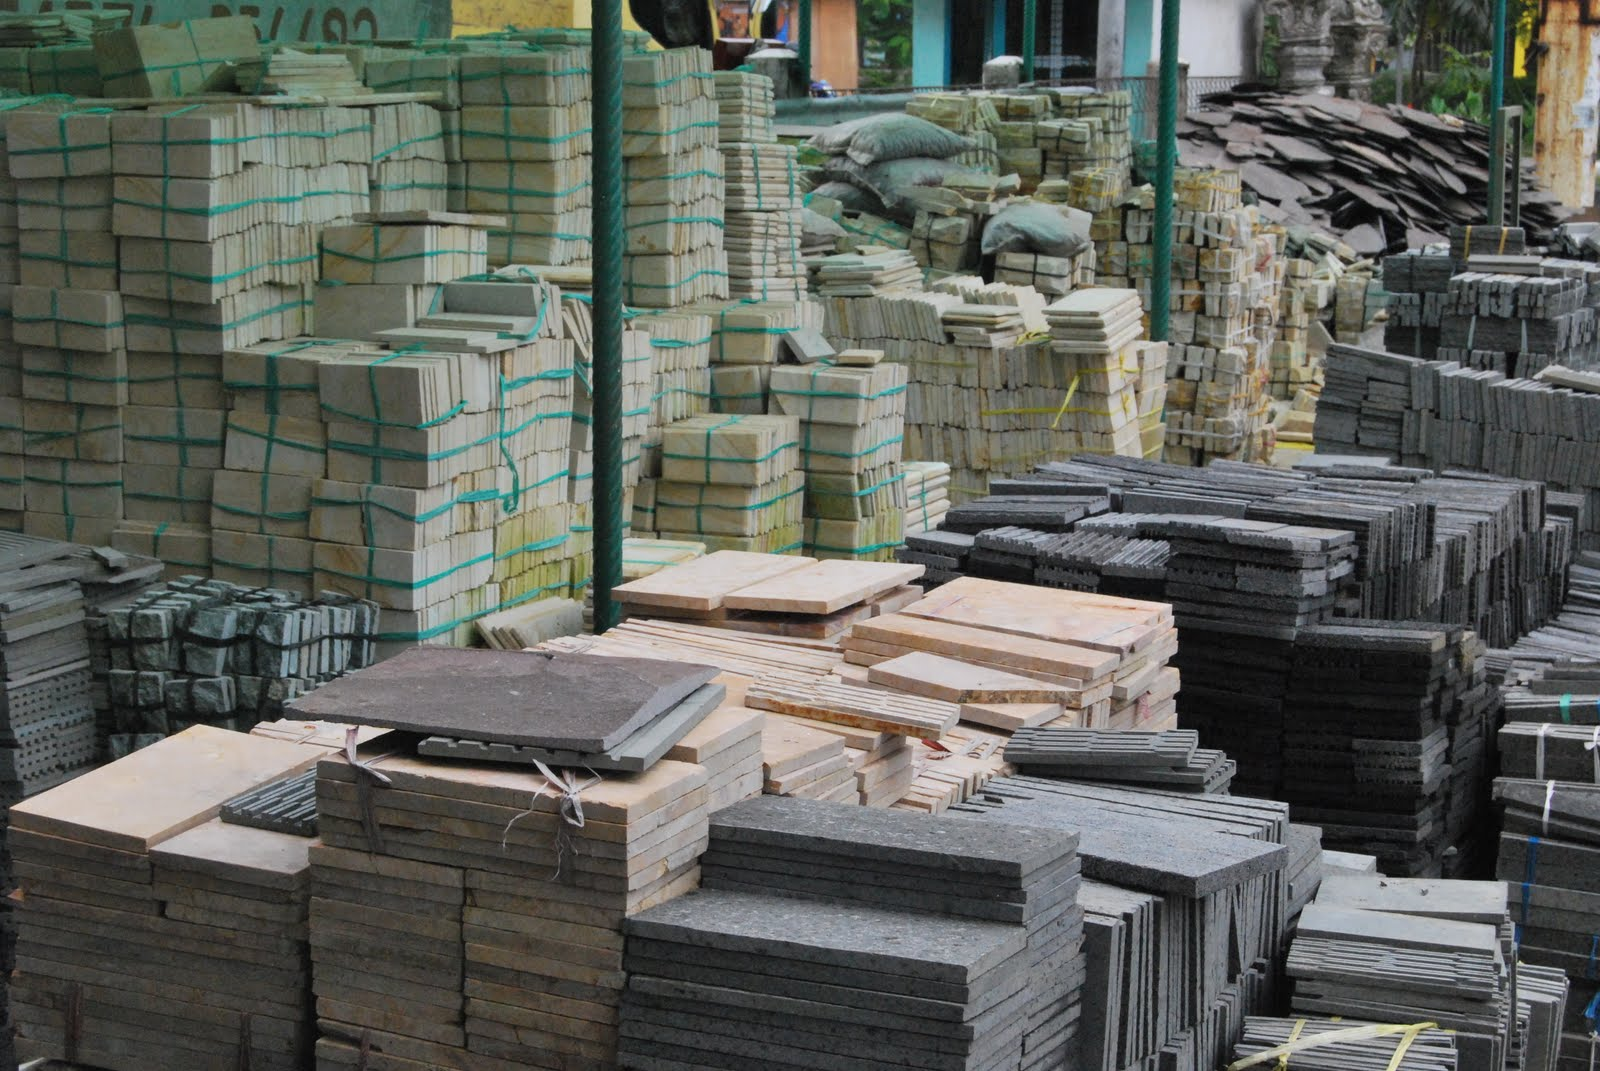 majalah dahsyat palembang eksotis batu alam penghias griya